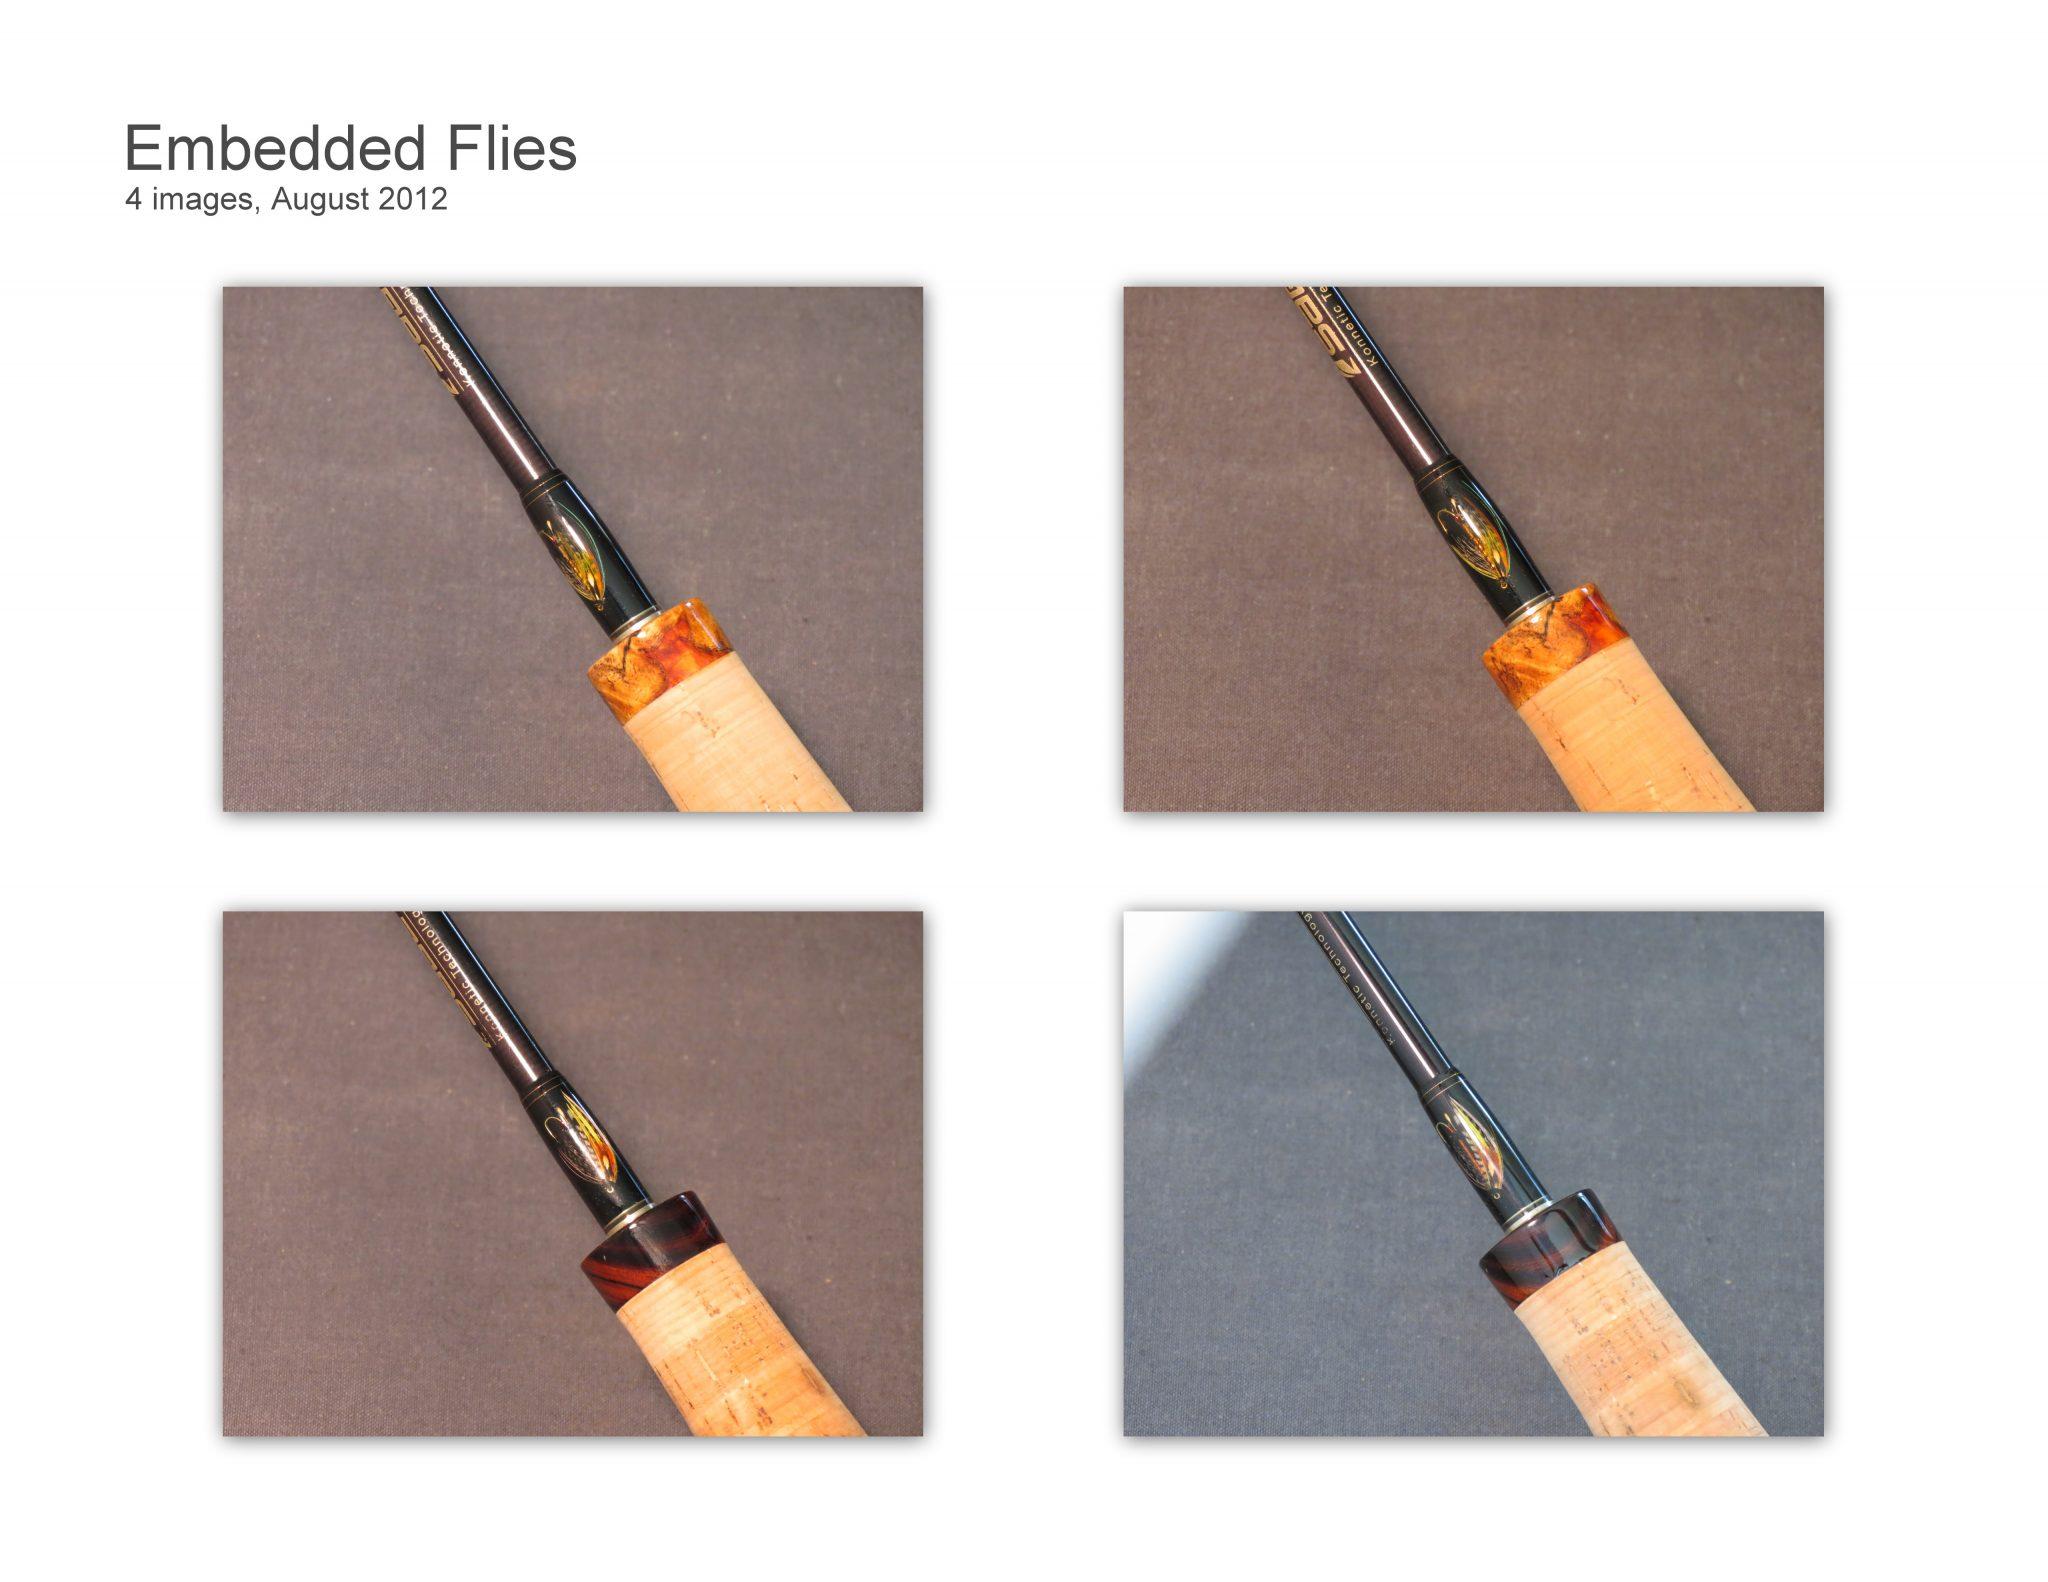 Embedded Flies